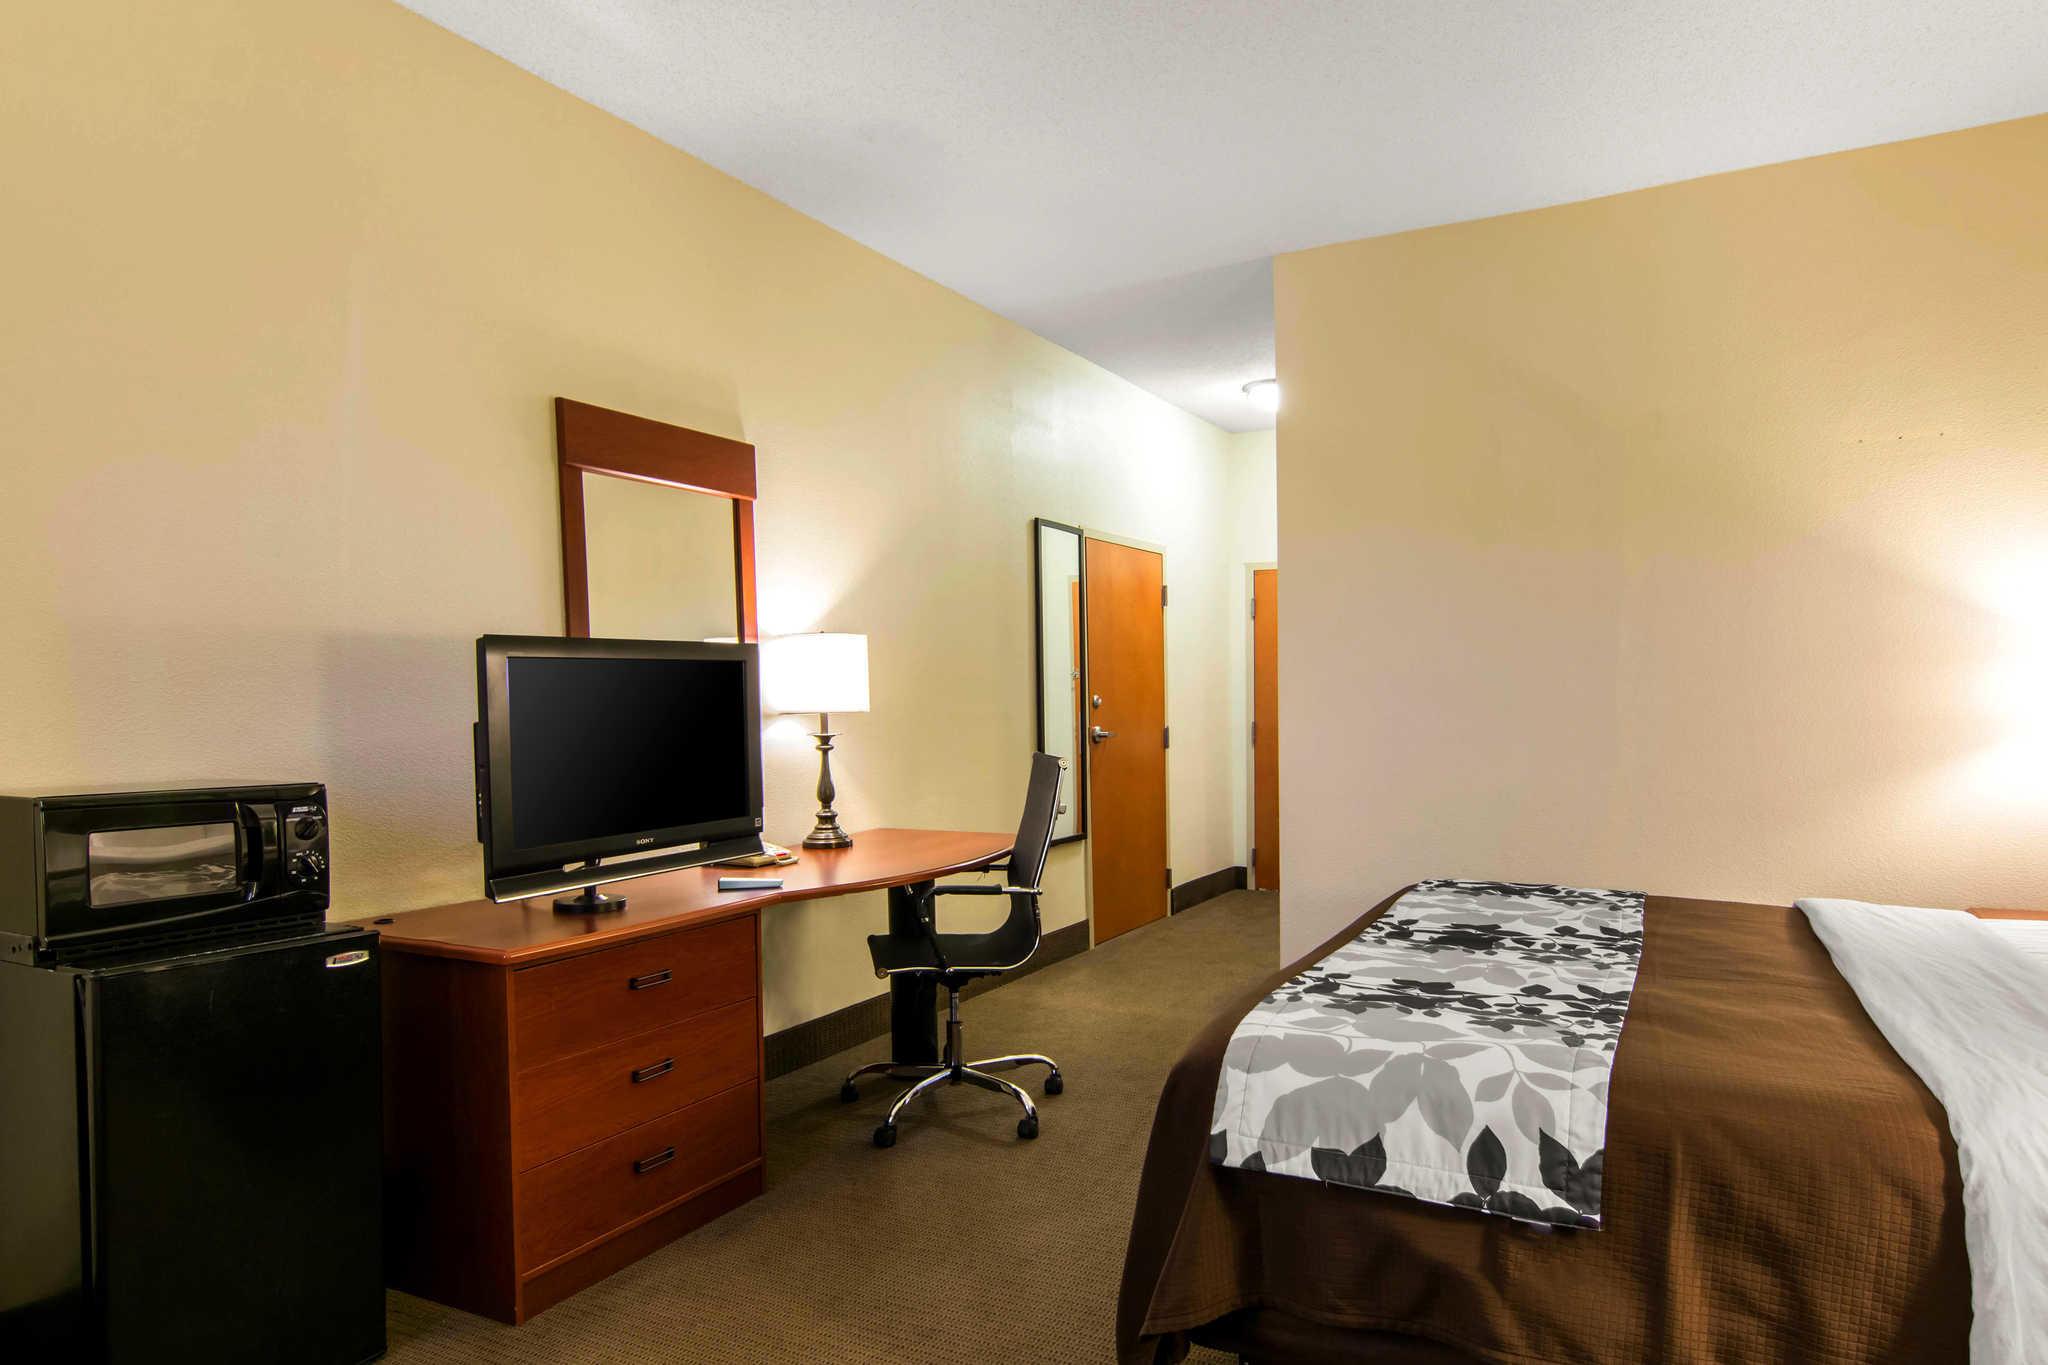 Sleep Inn & Suites At Fort Lee image 11